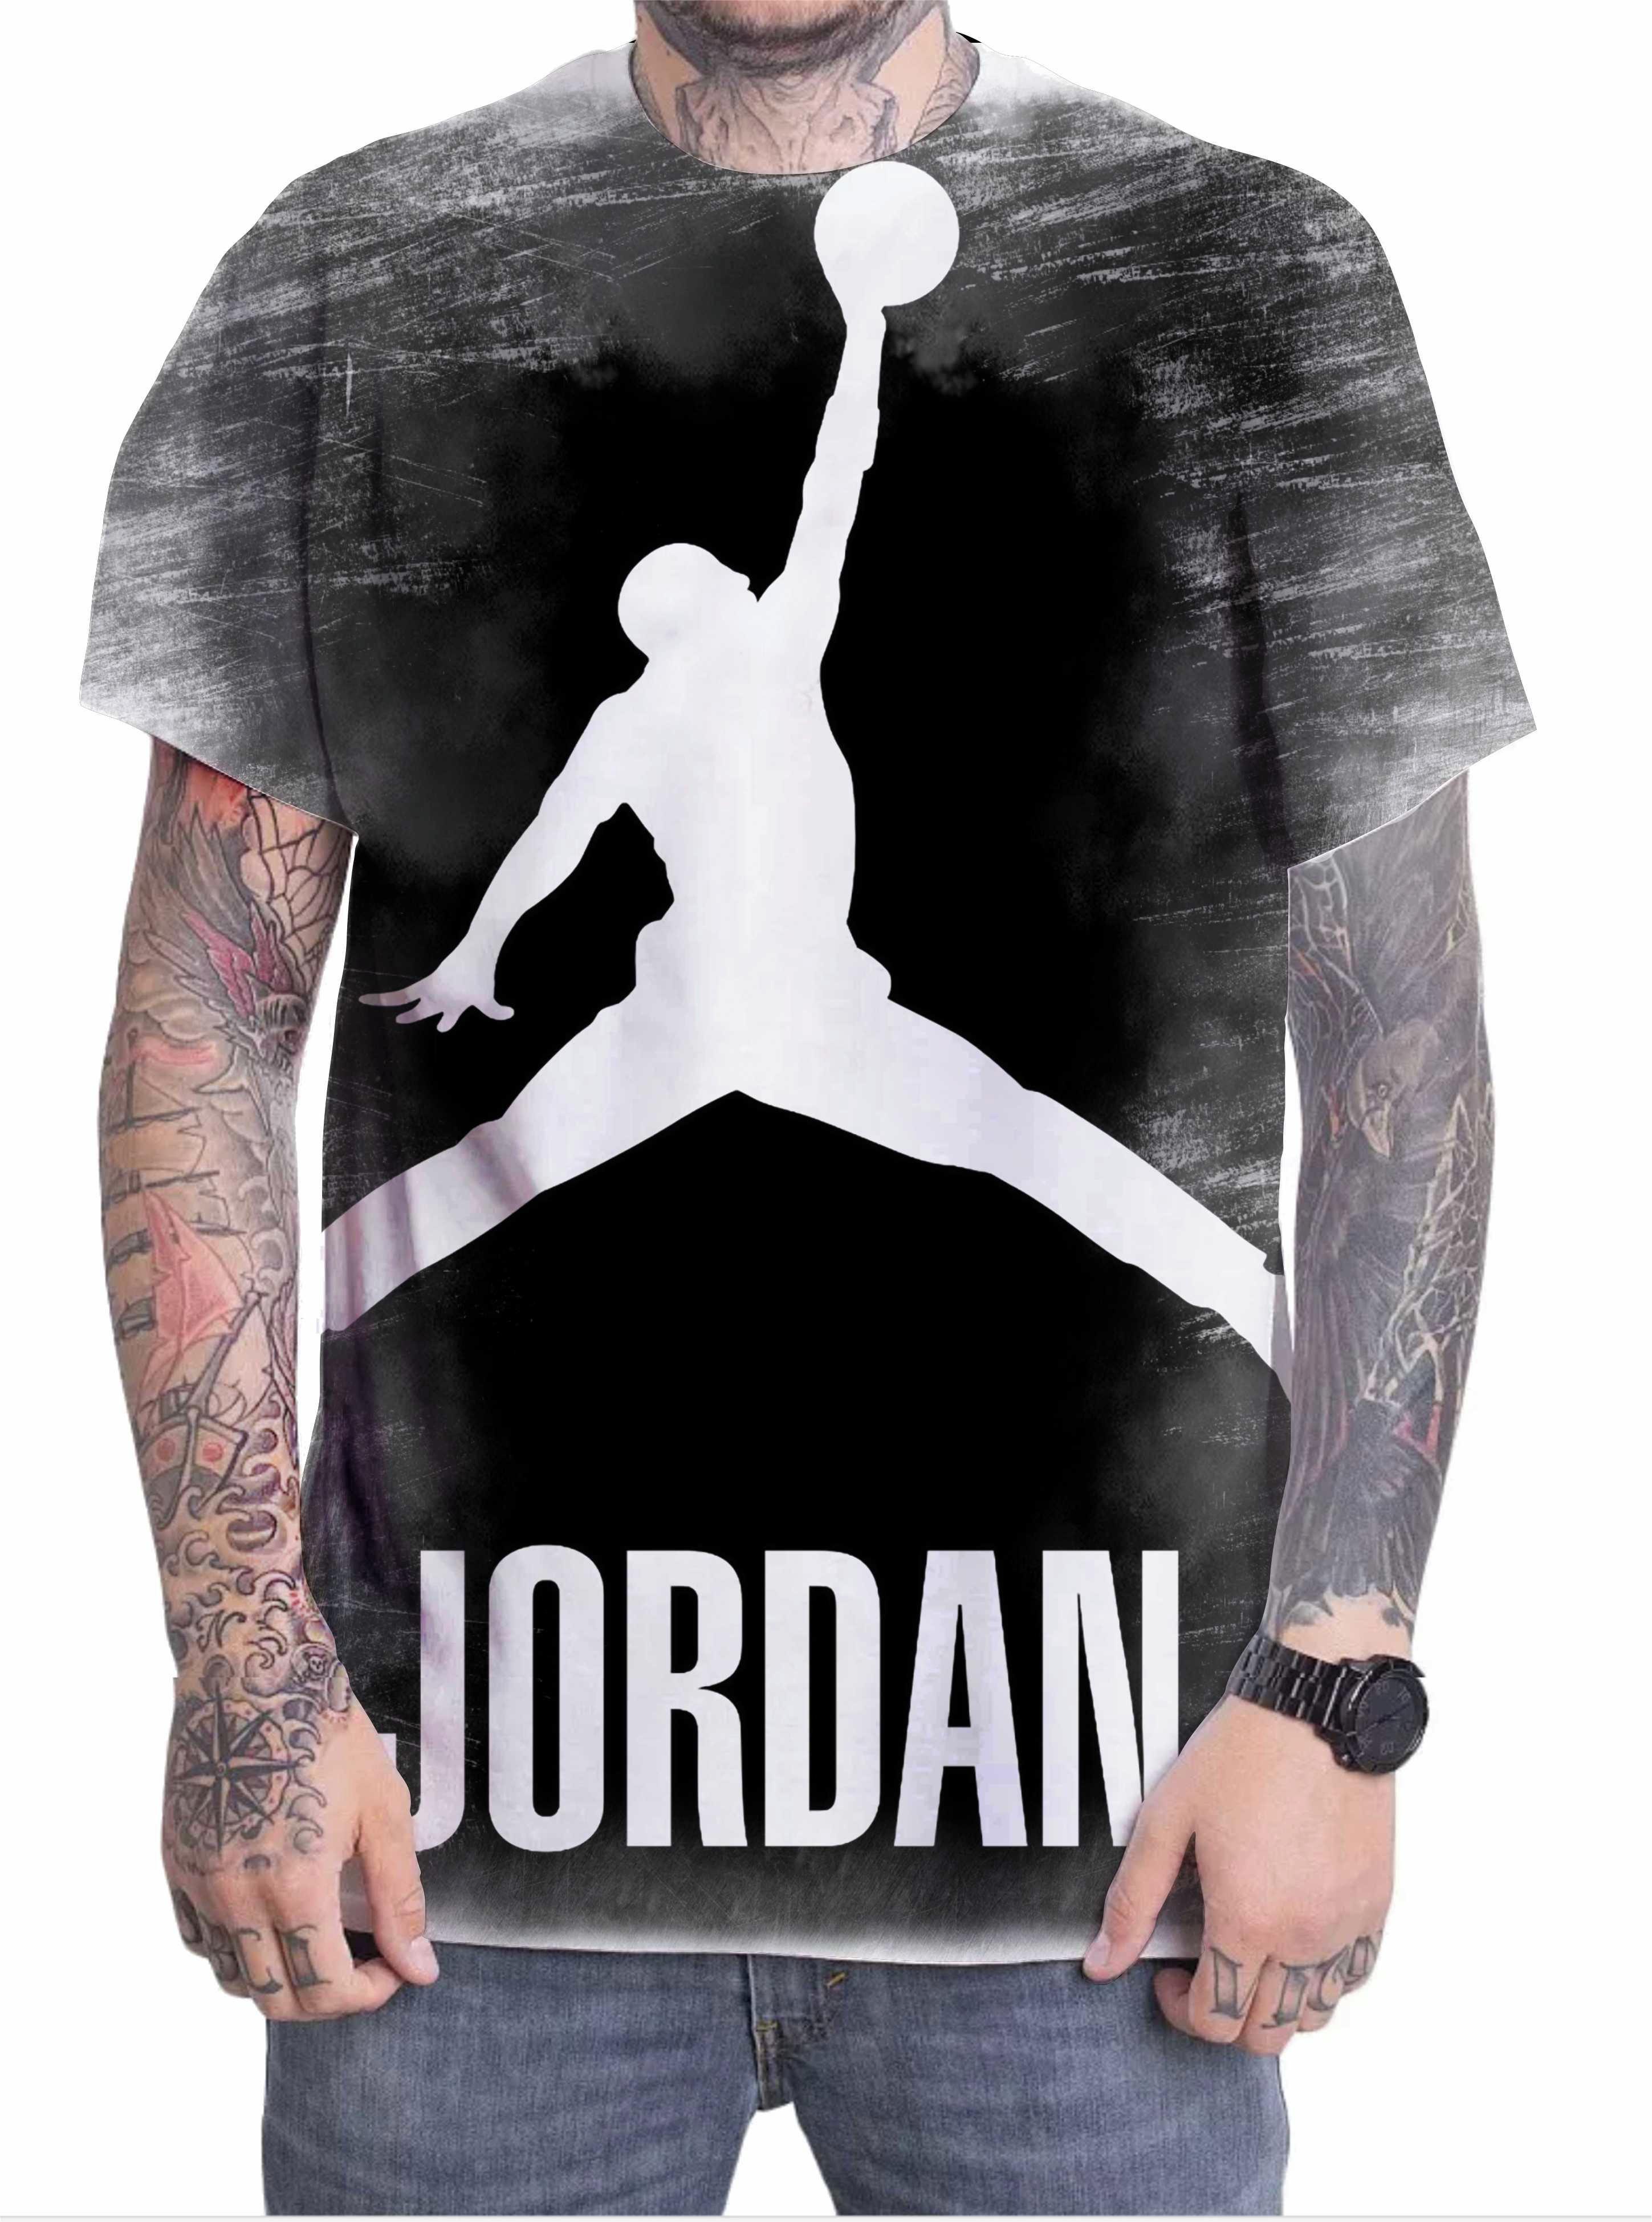 4f865324bdd Camiseta Camisa Personalizada Jogador Michael Jordan 08